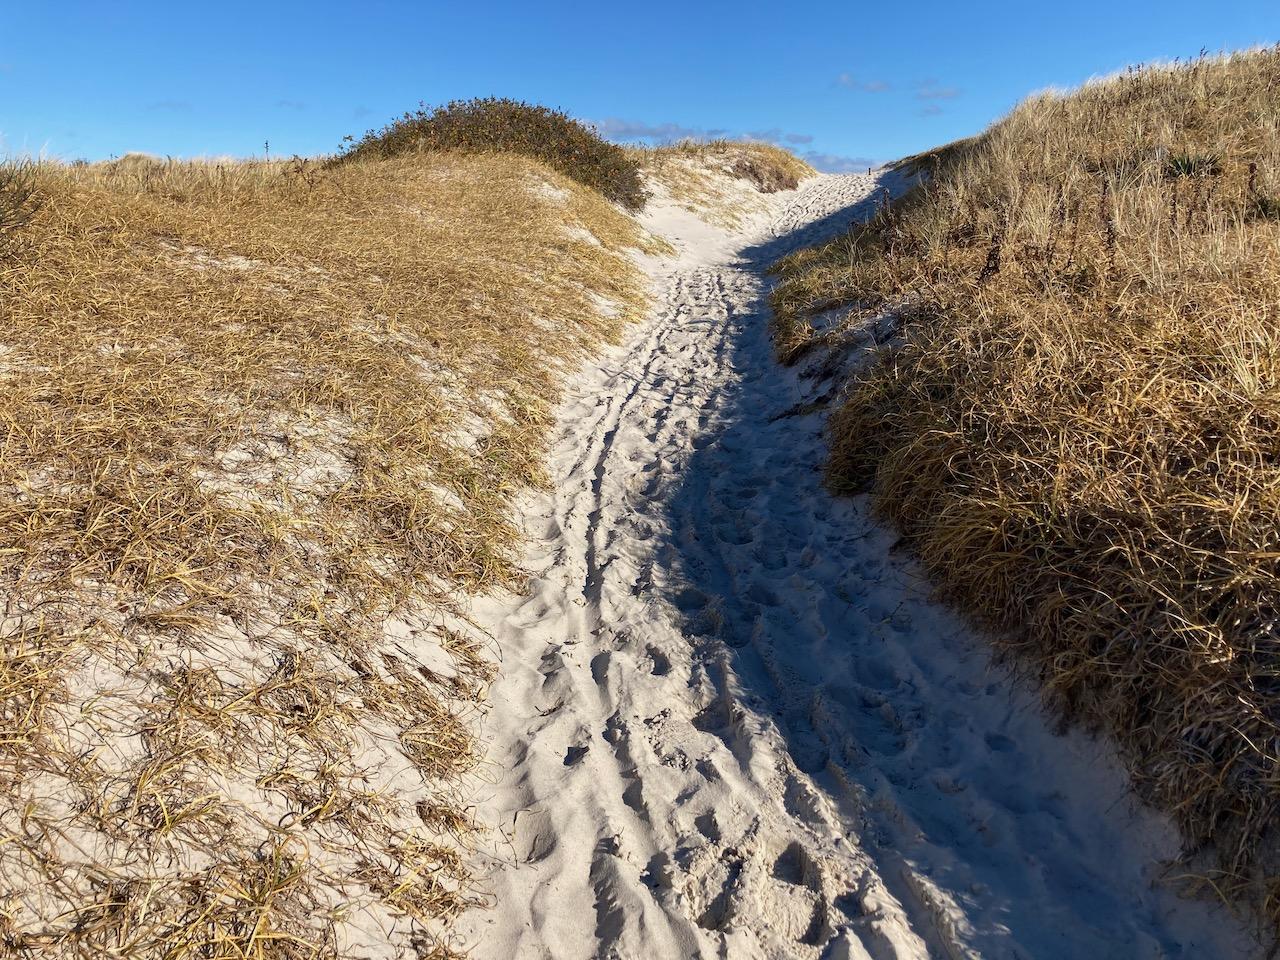 Sand path through dunes covered in beach grass.